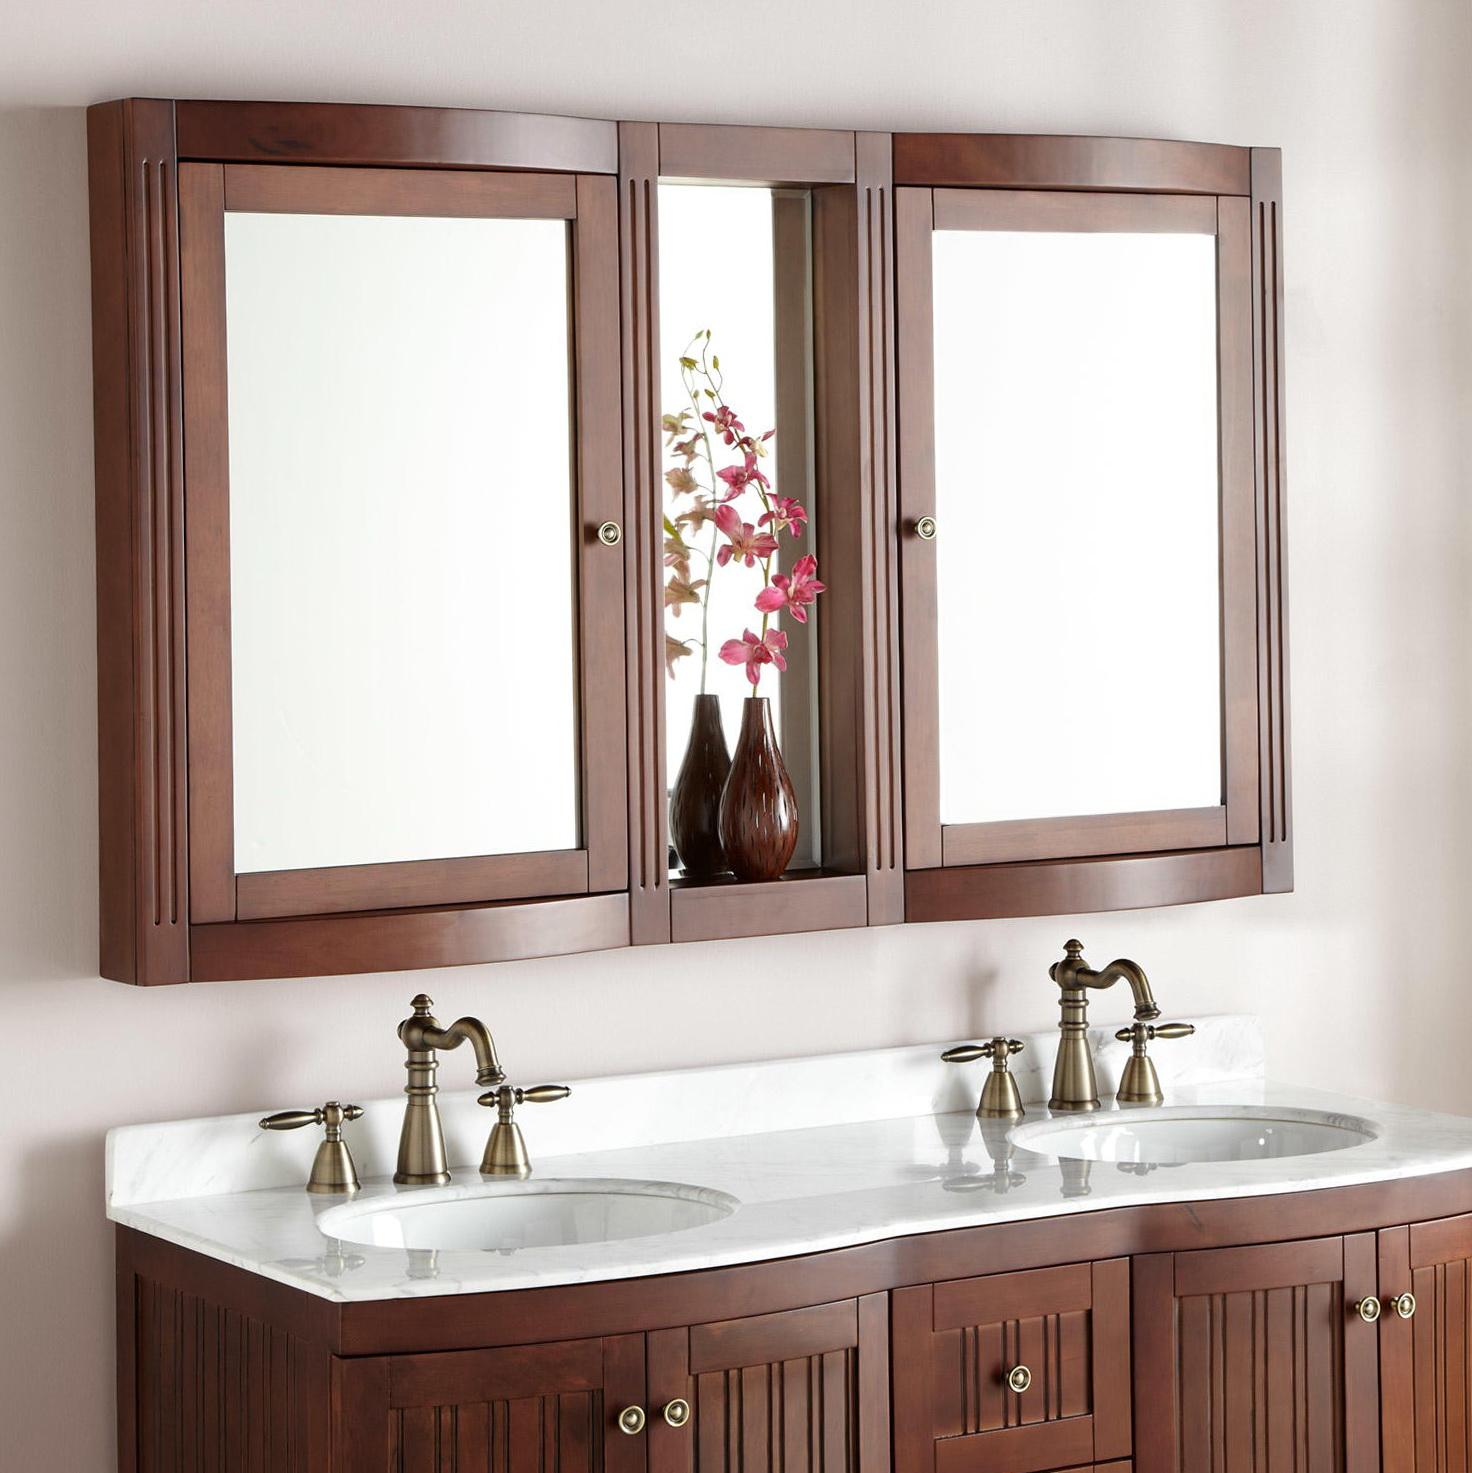 60 Inch Mirror Medicine Cabinet Home Design Ideas